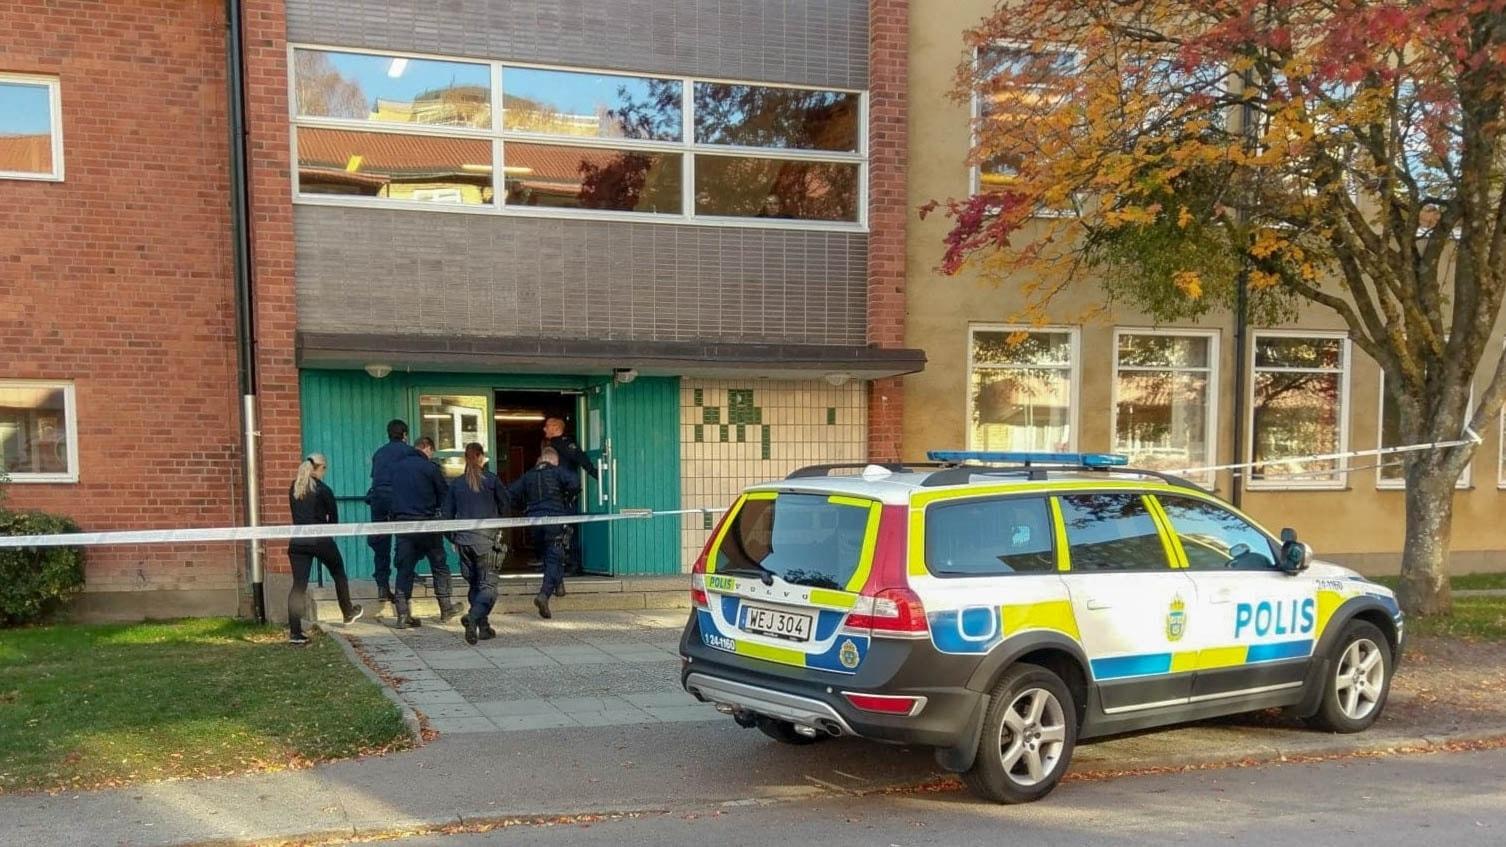 Pojke skadad misstankt mordforsok pa skola